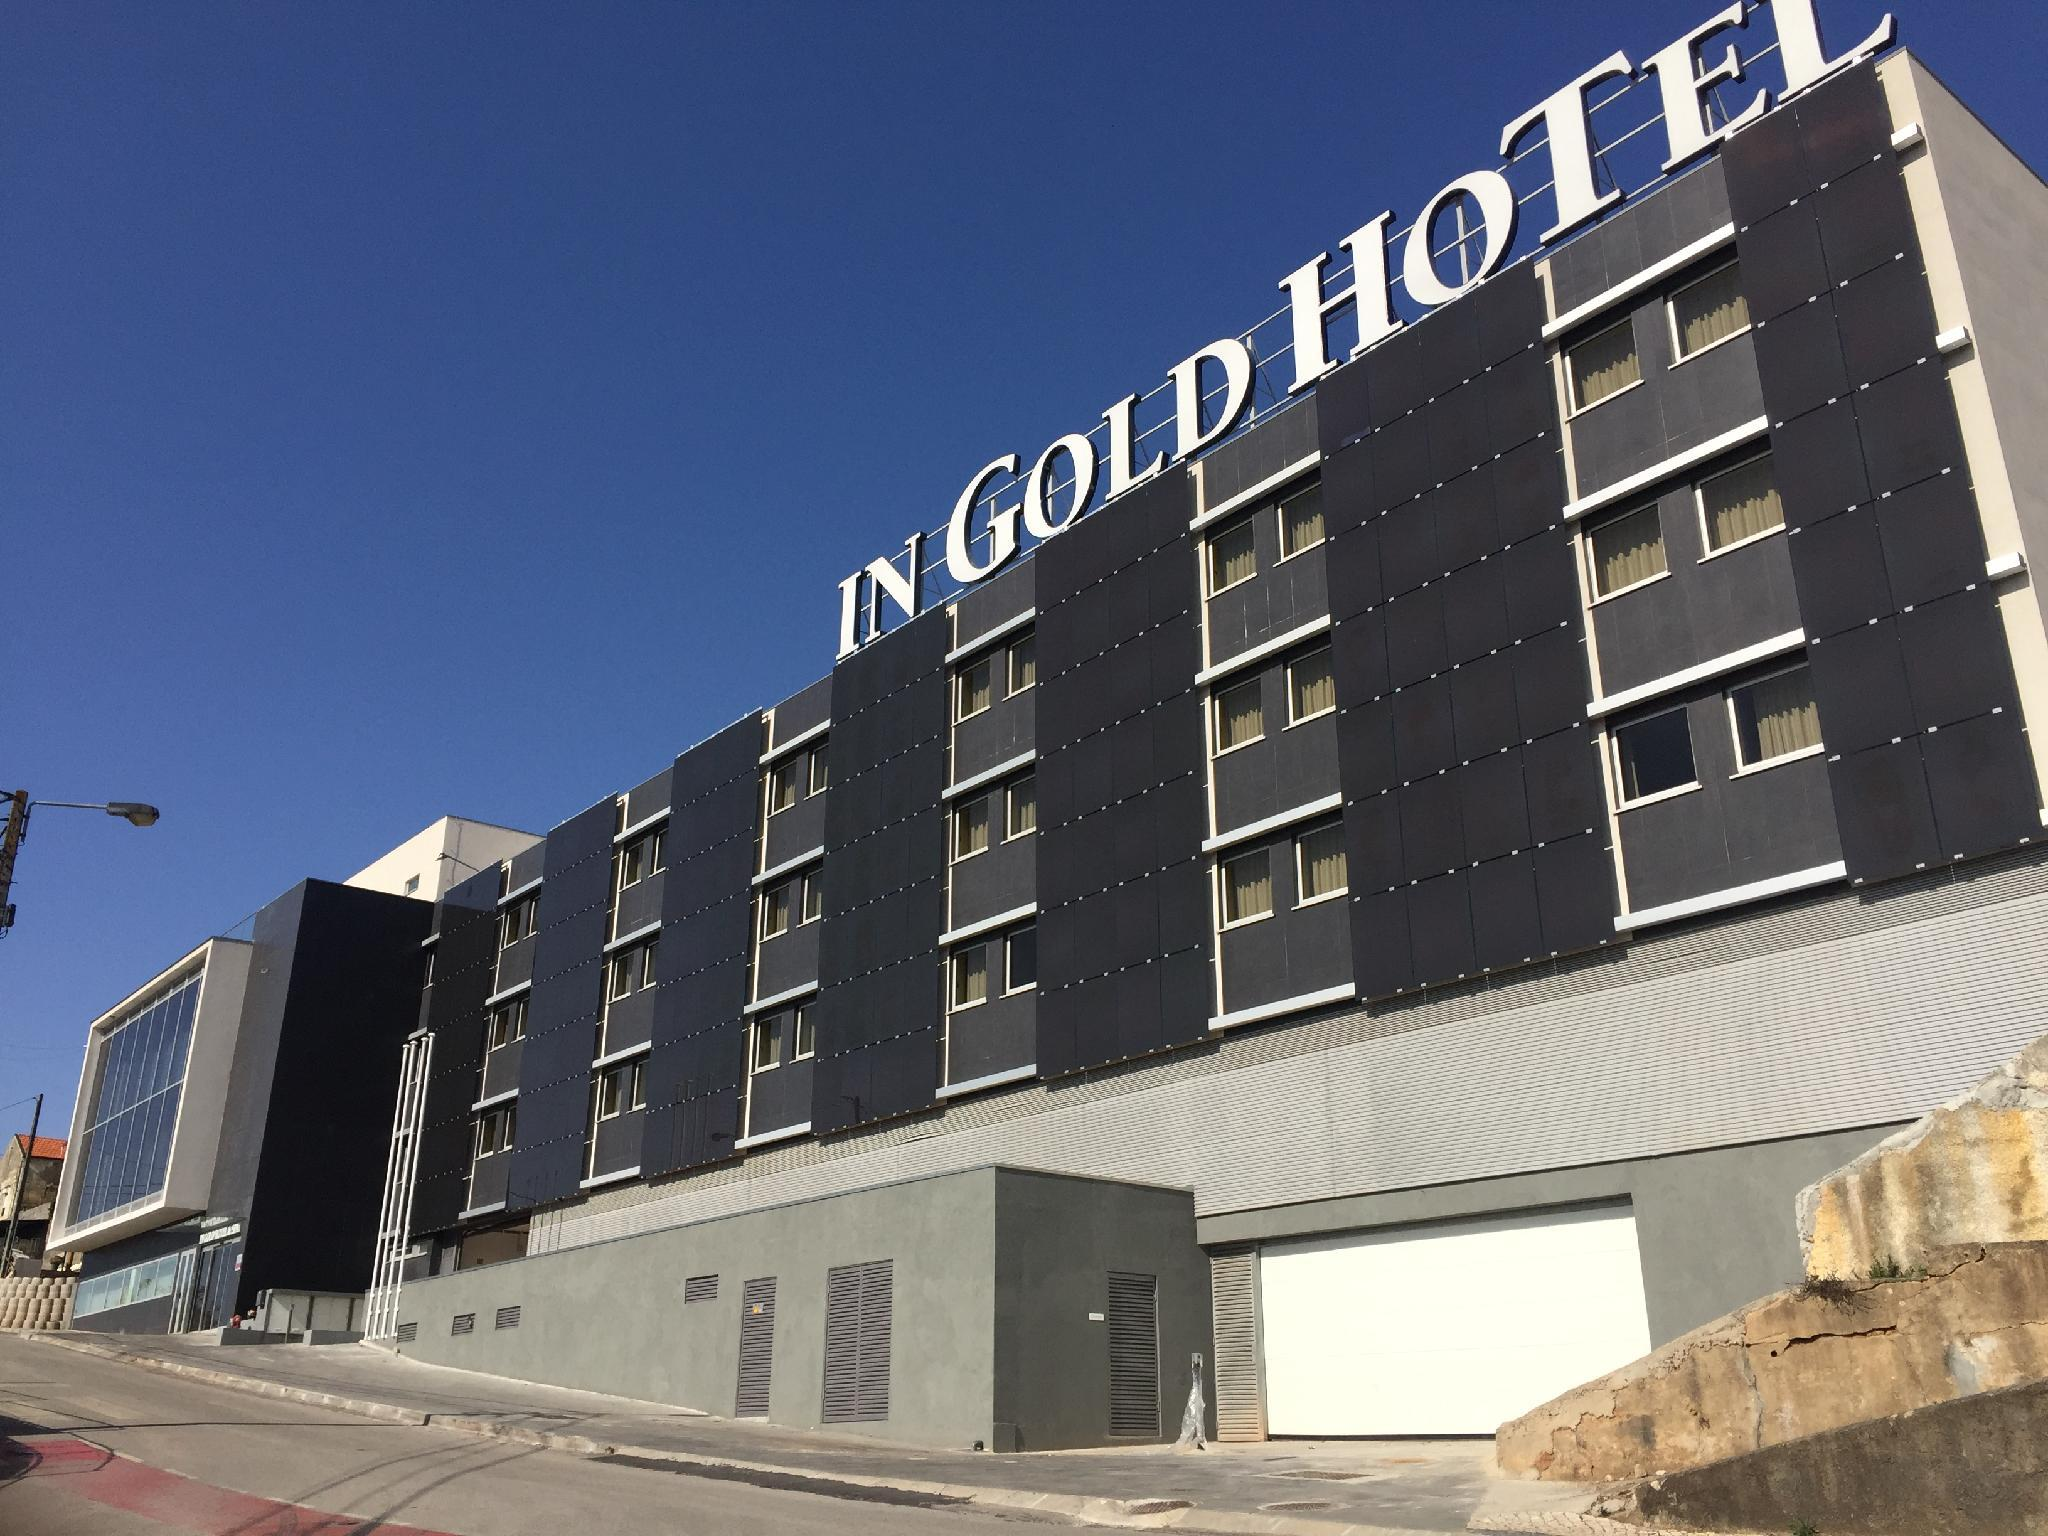 Hotel Golden Tulip - Águeda